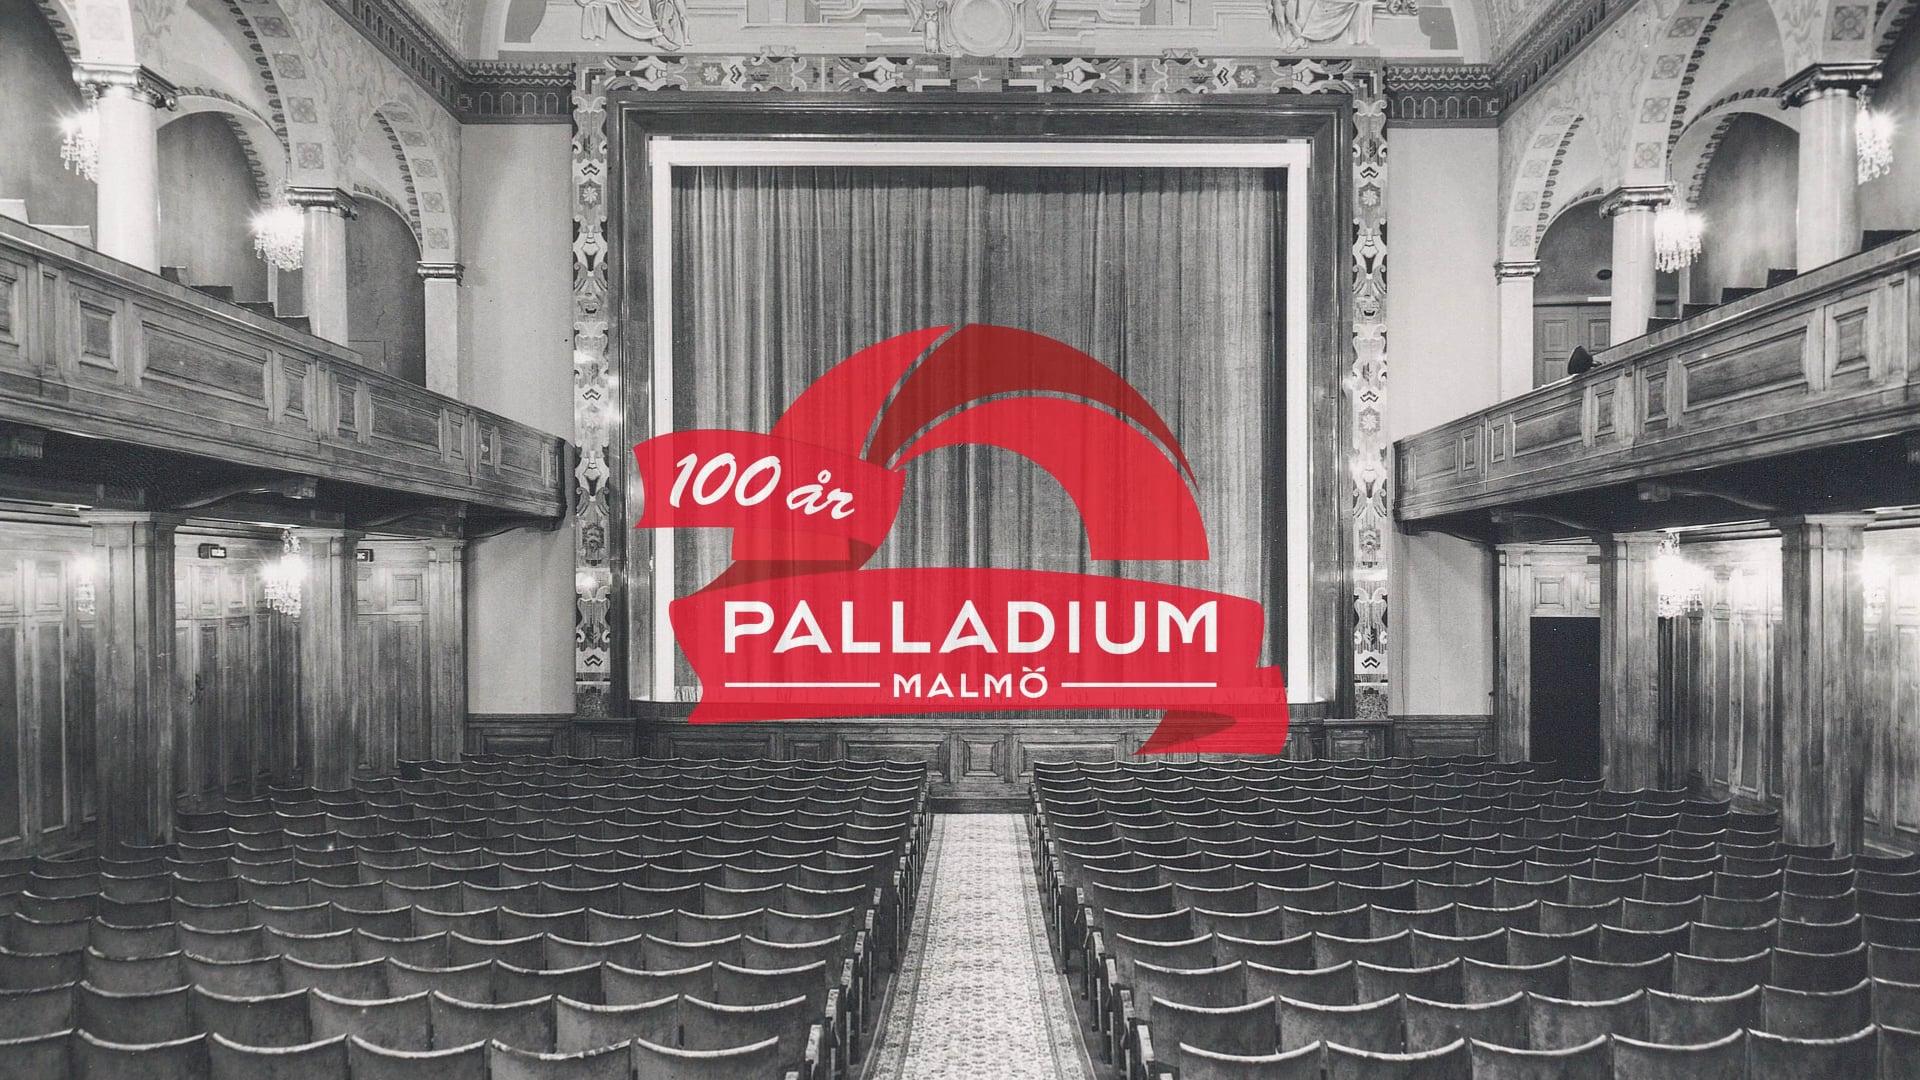 palladium_jub_100_1080hd-2000